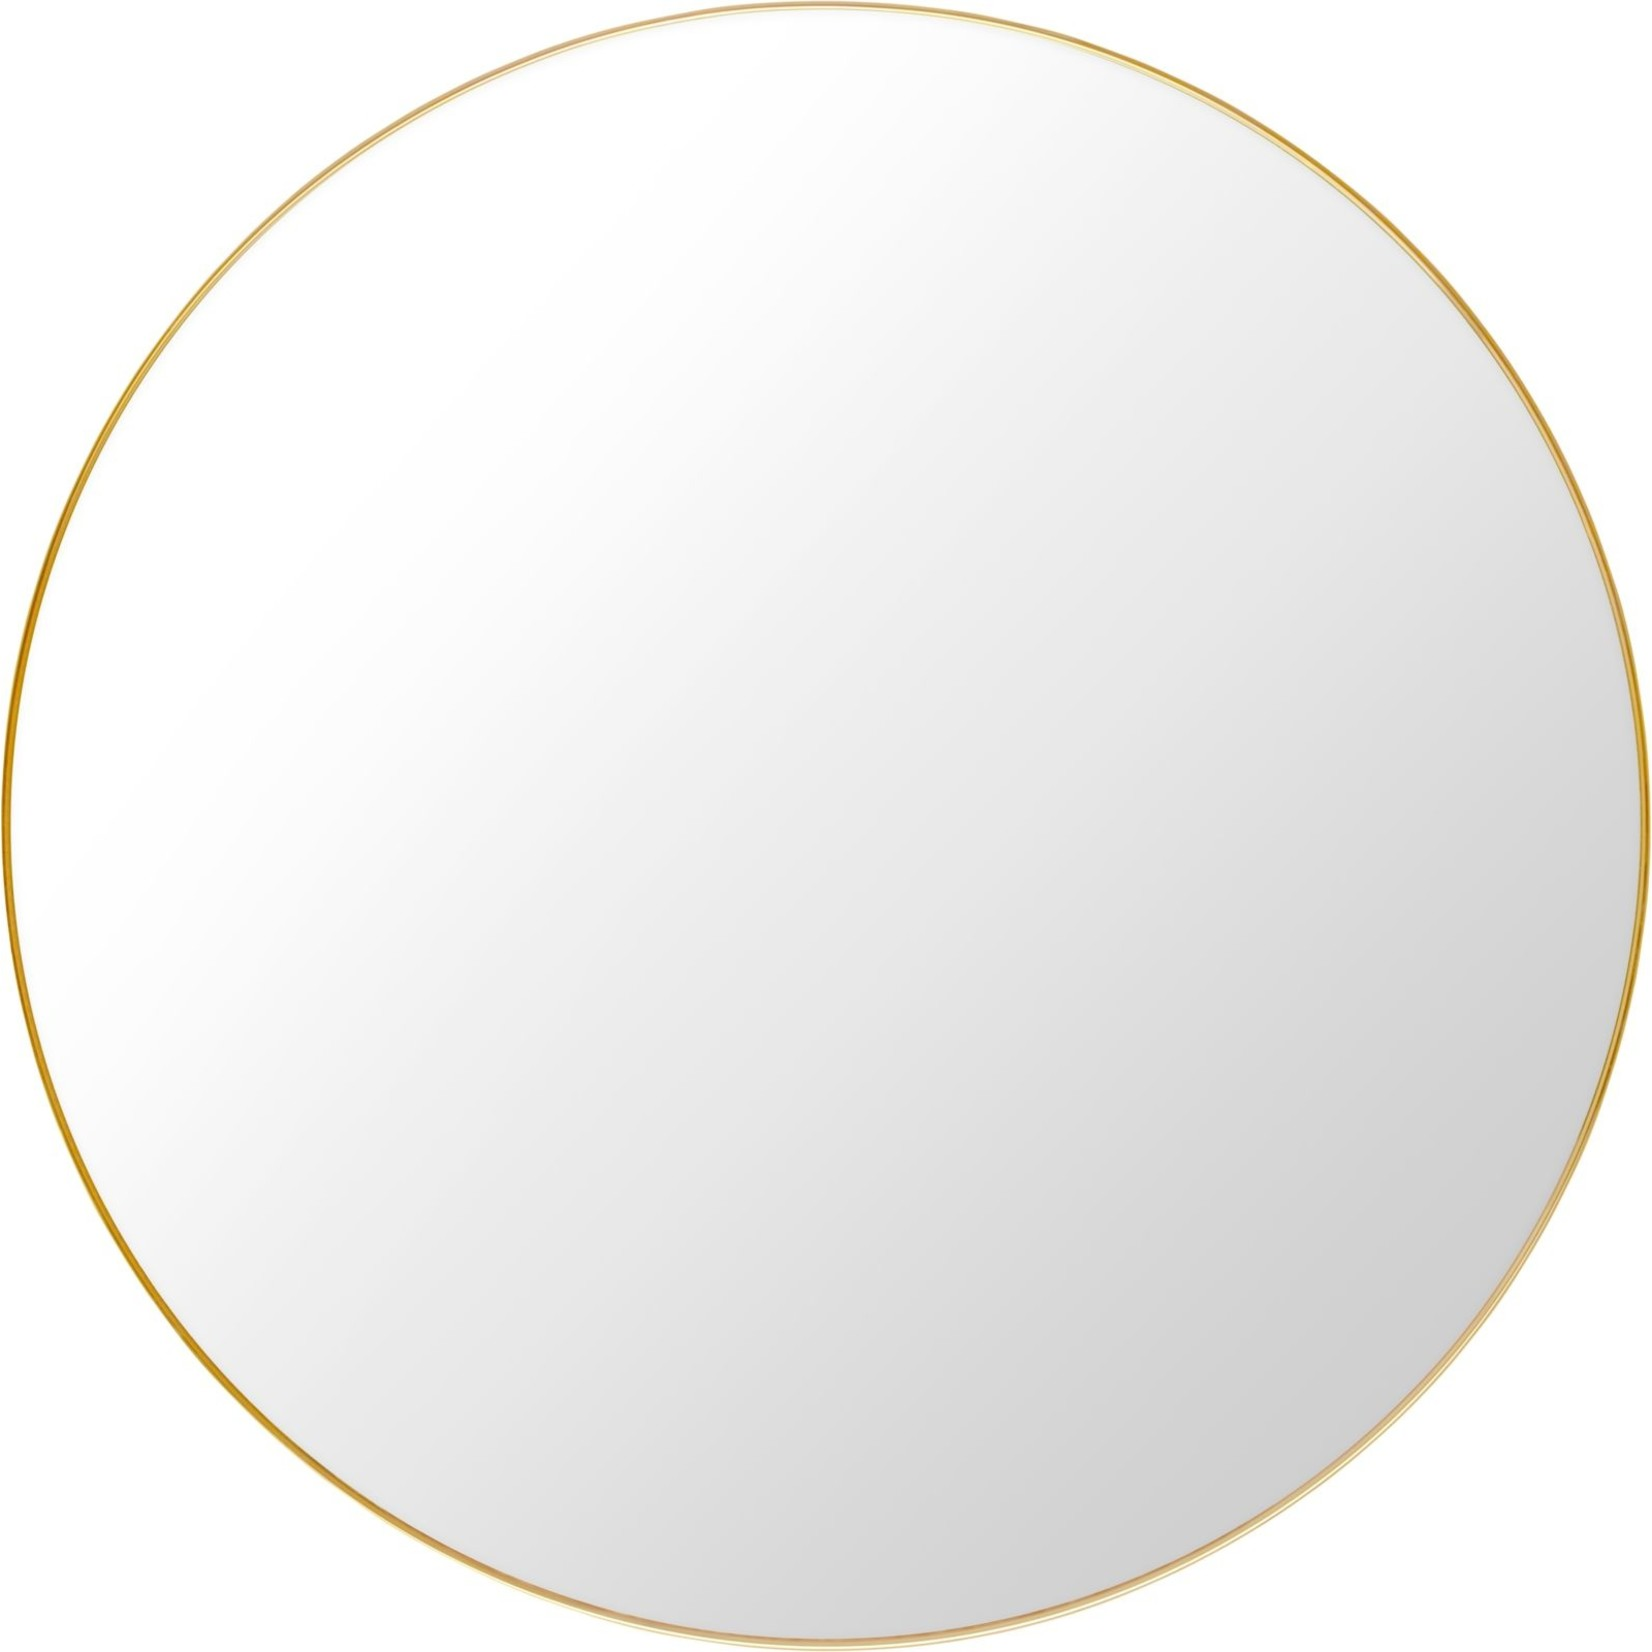 Gubi Wall mirror - Round - Ø110 - Polished Brass